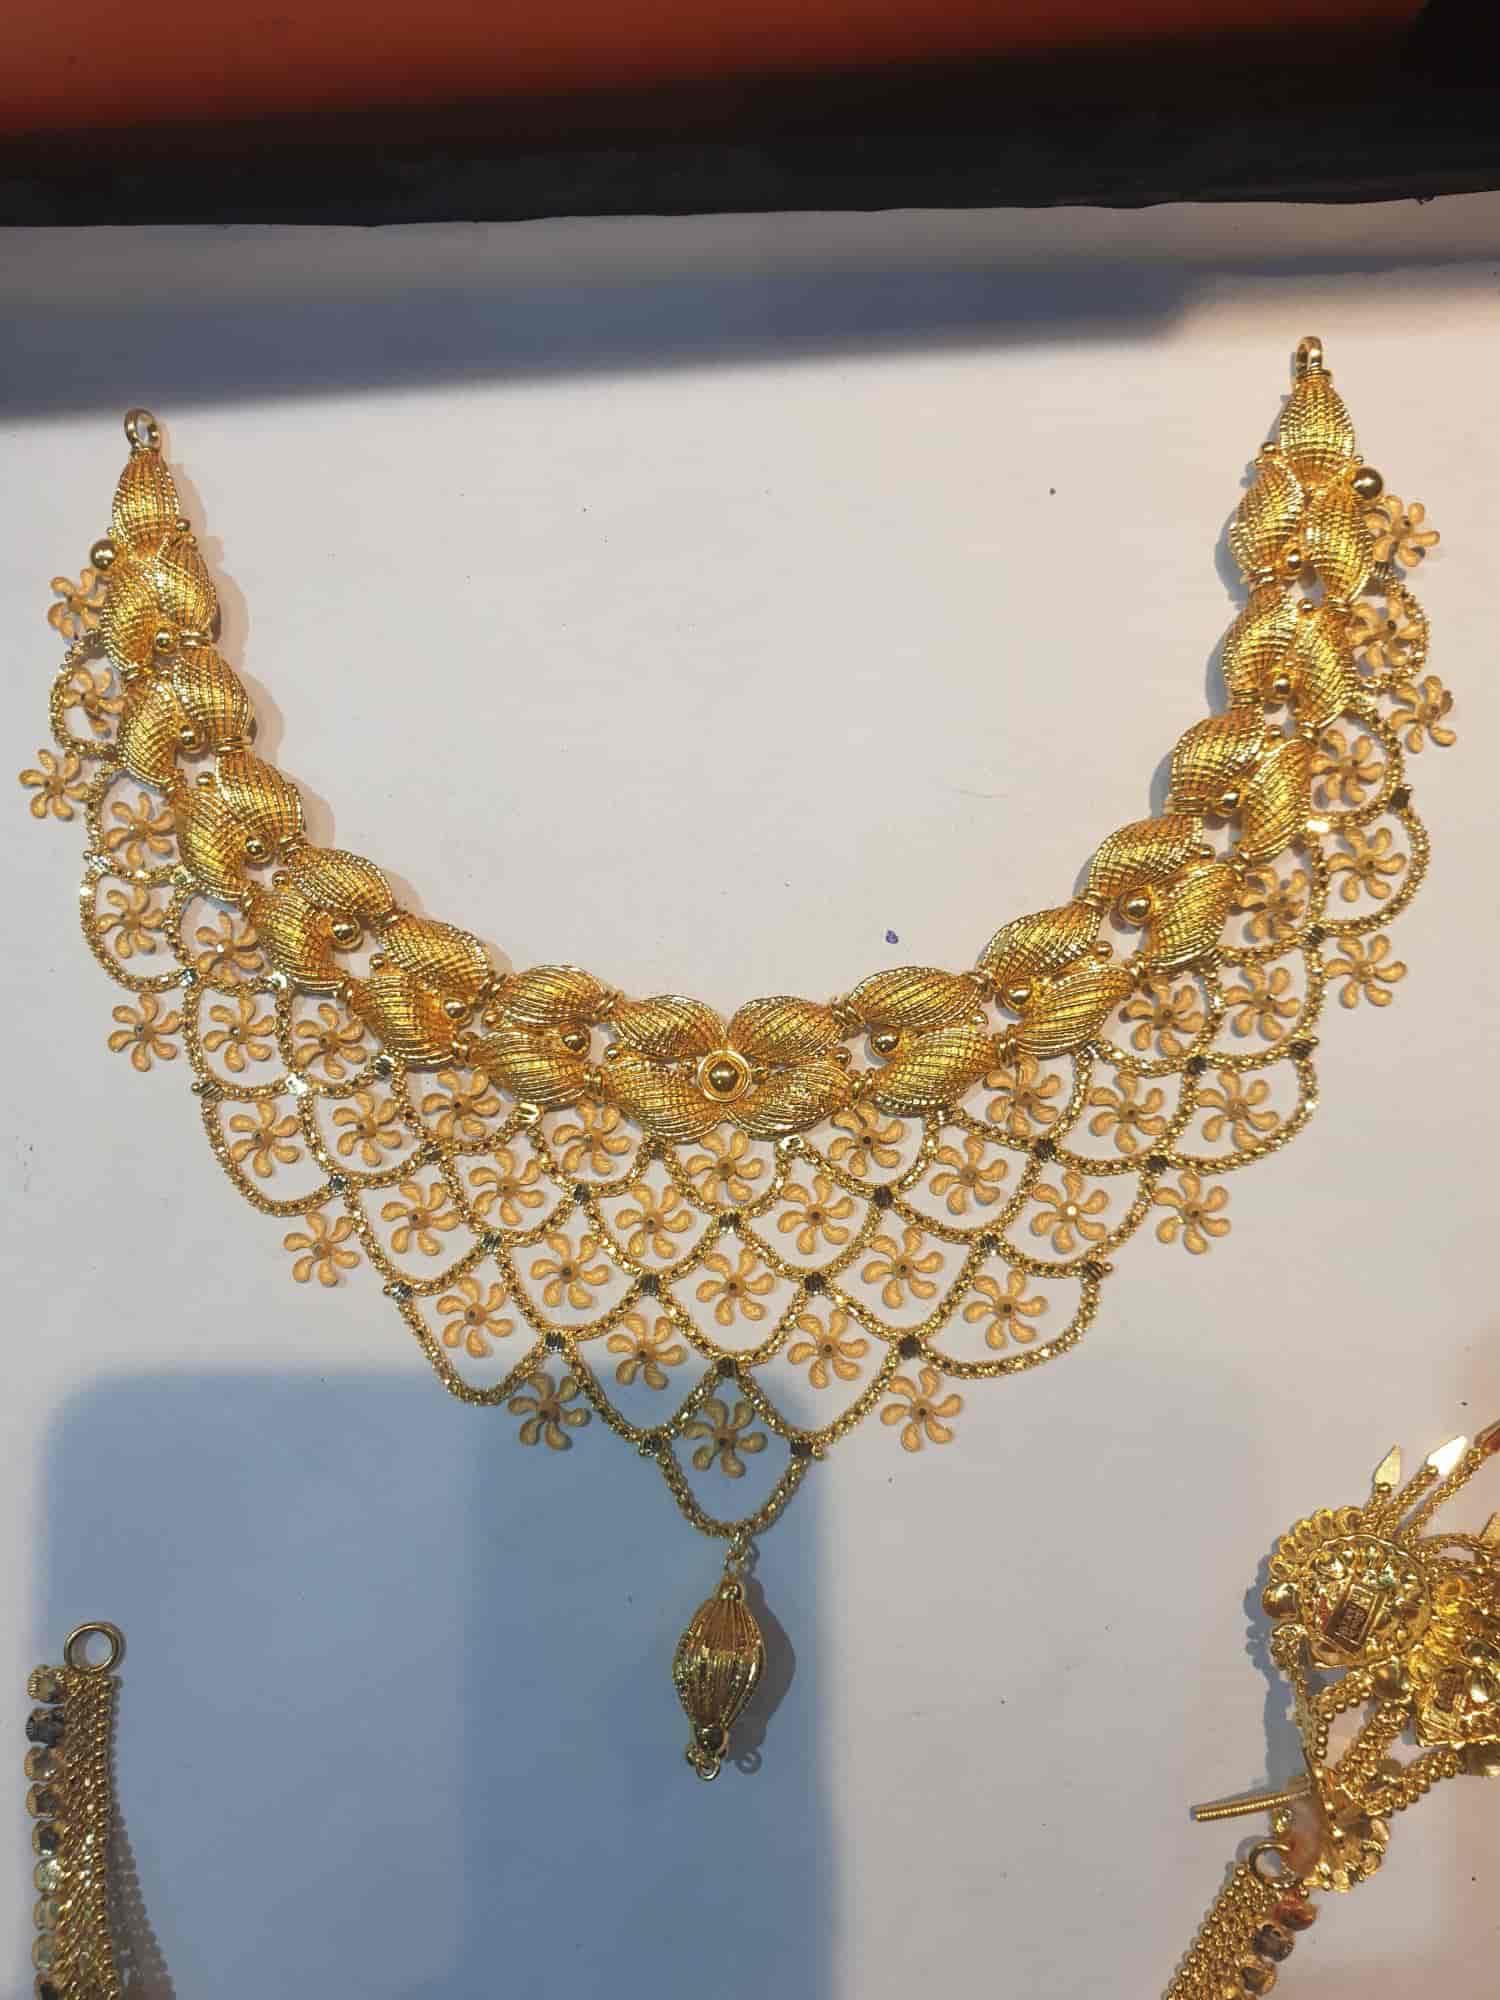 Navratan Jewellers, Boring Road - Jewellery Showrooms in